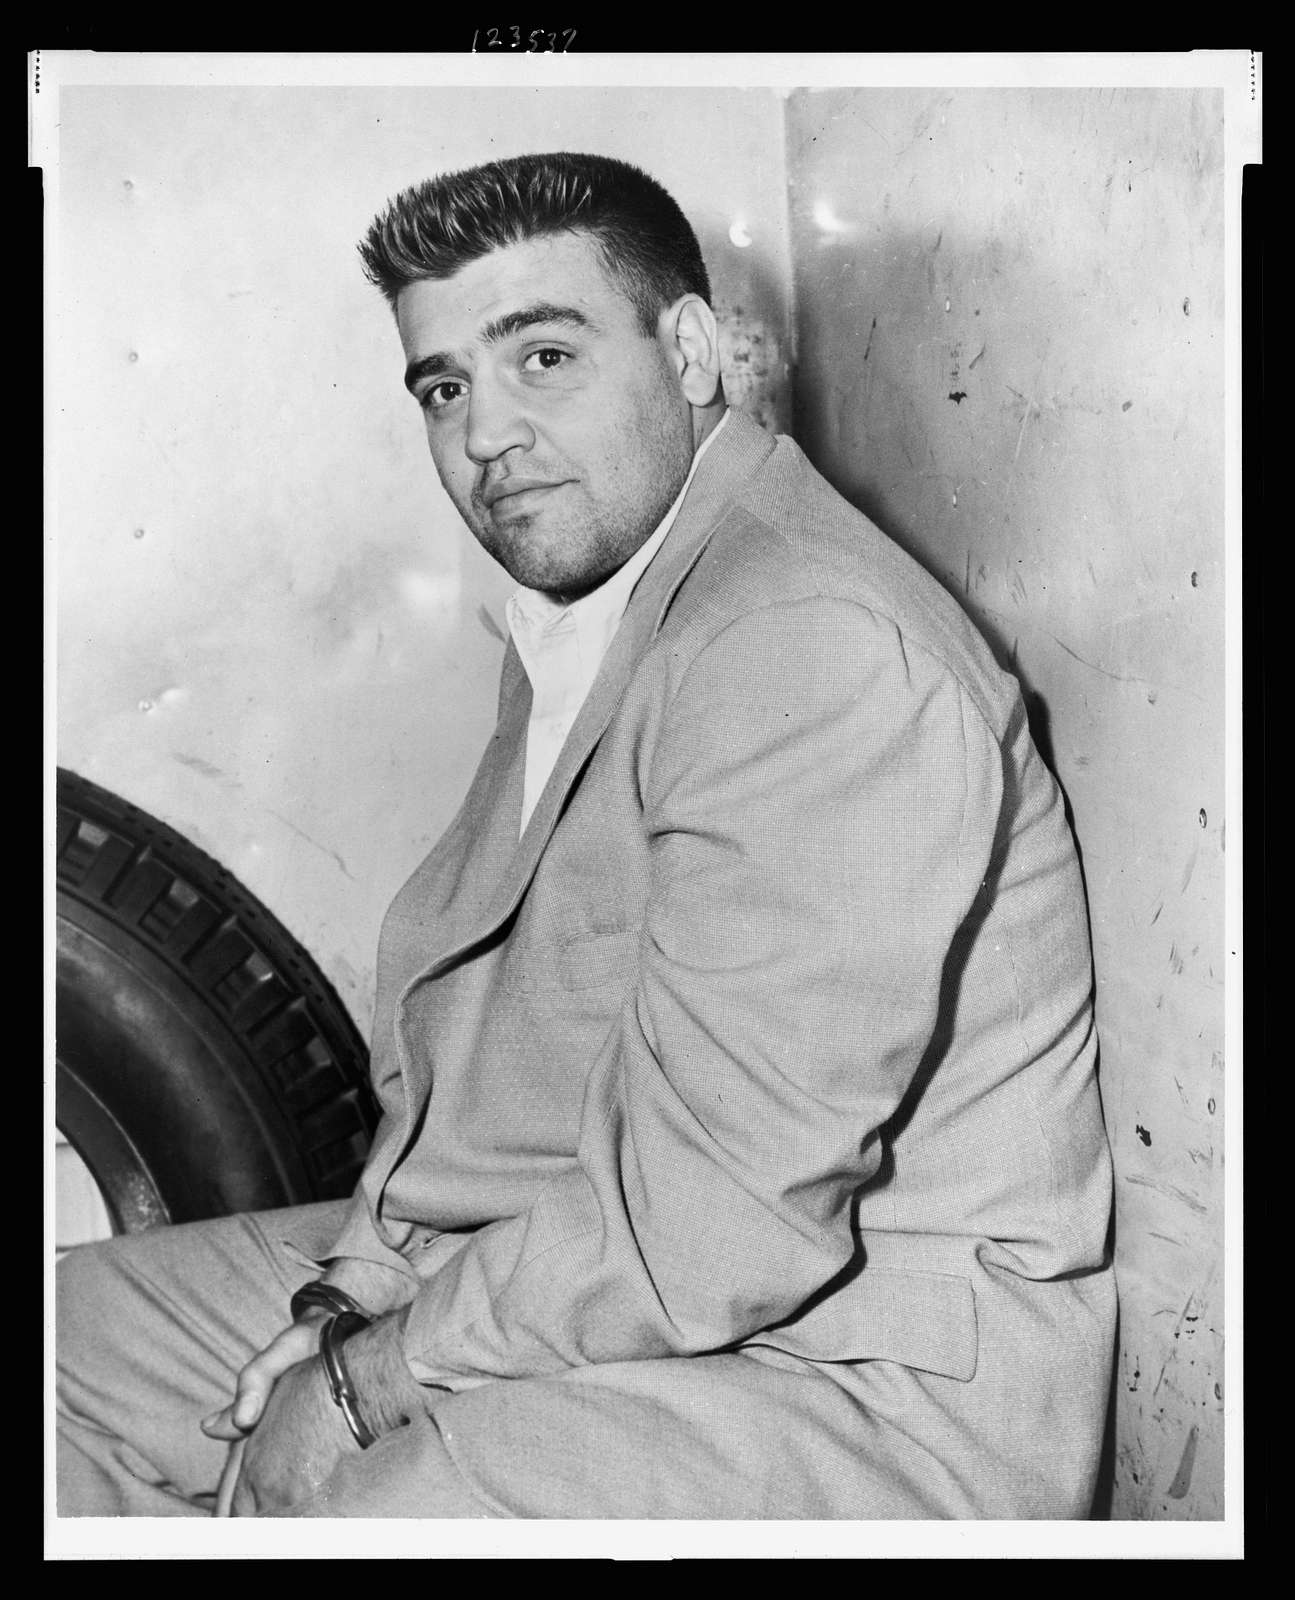 [Vincent Gigante, three-quarter length portrait, seated, facing front] / World Telegram & Sun photo by Phil Stanziola.